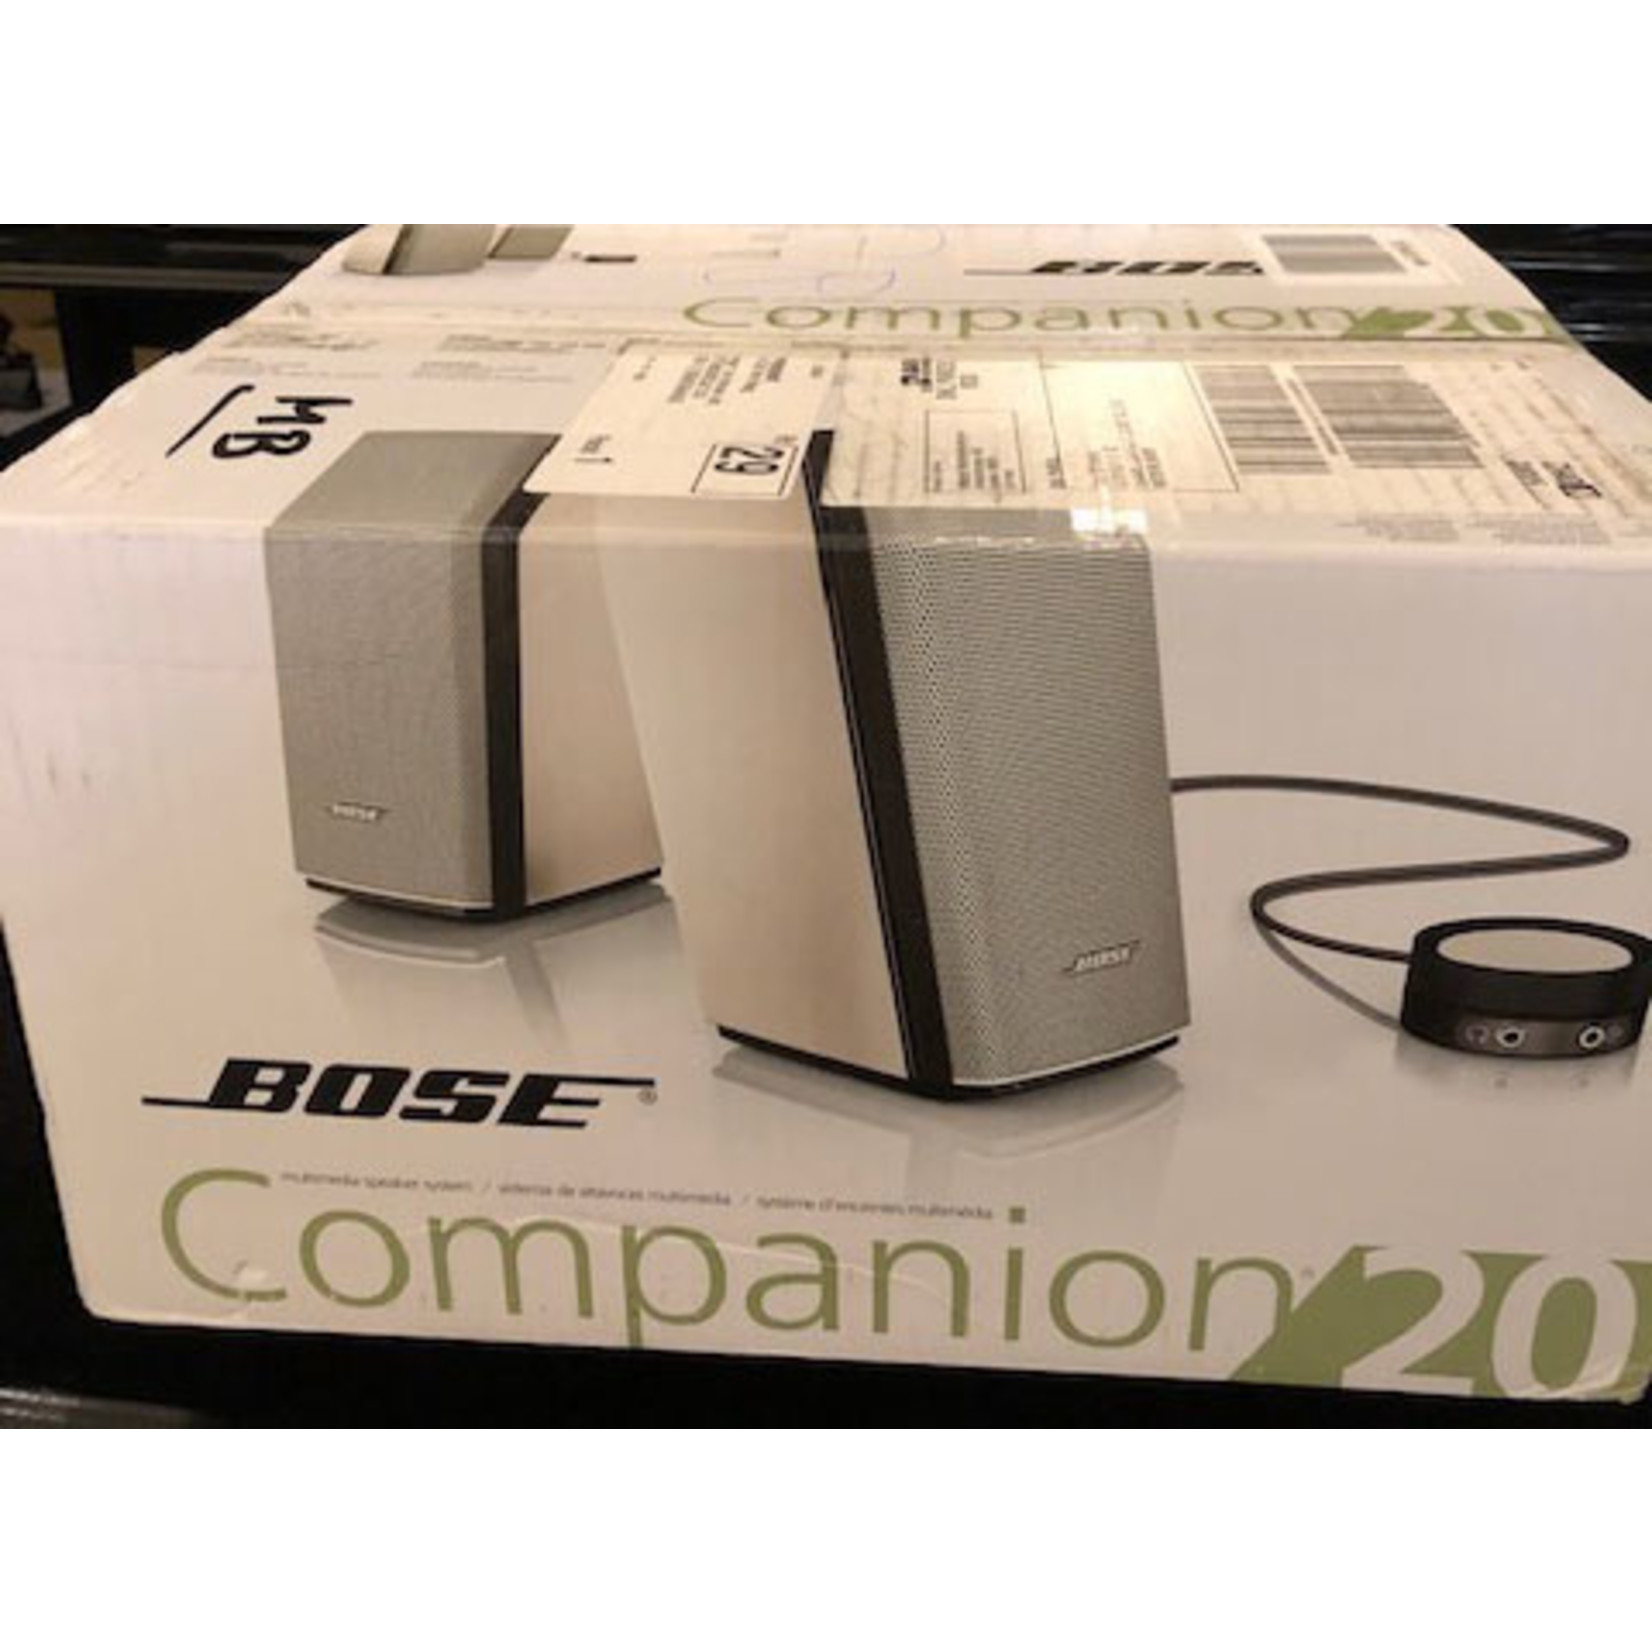 Bose L'orateur Bose